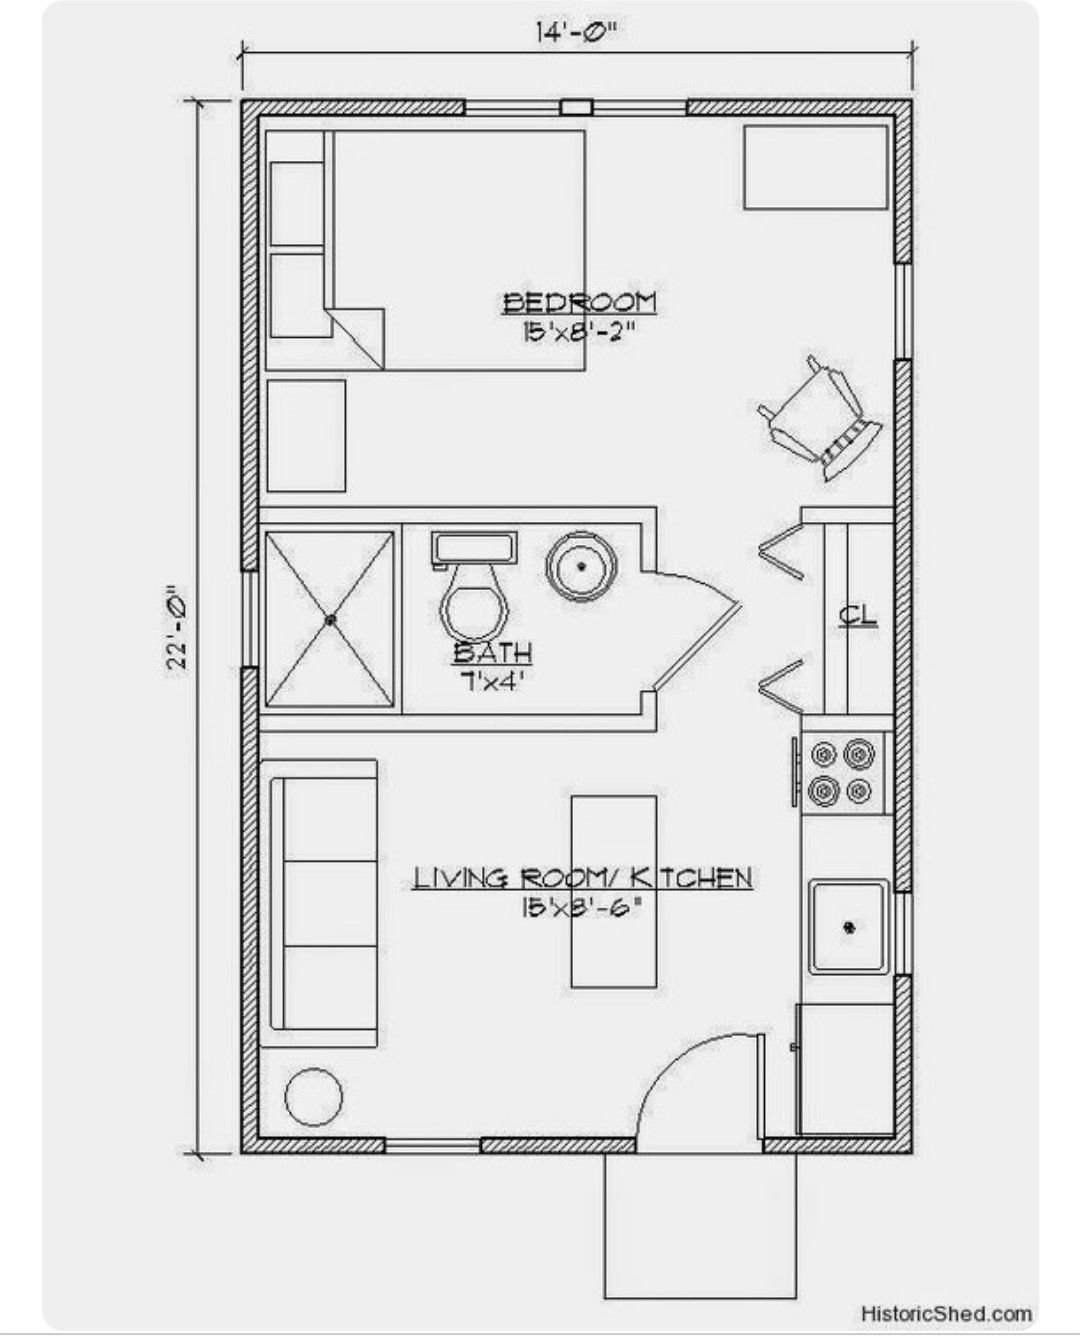 Small House 14x22 1 Bedroom Ecohouselayout Tiny House Floor